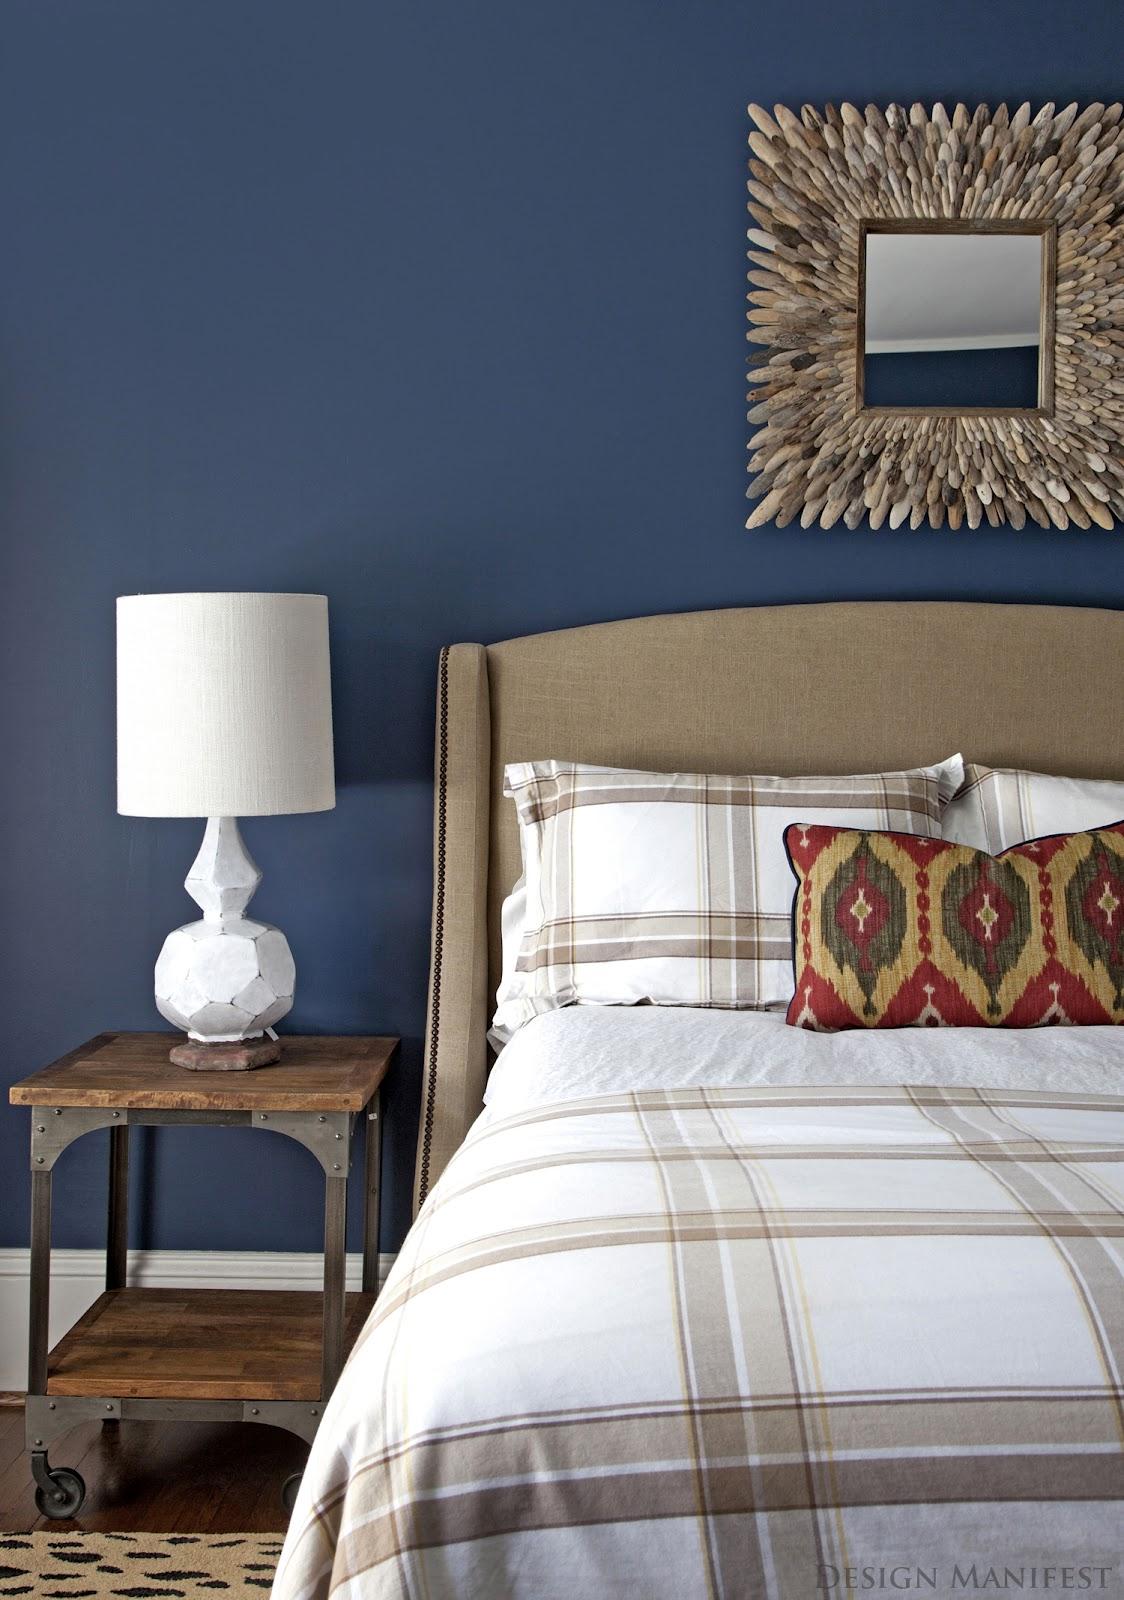 Airiness with posh navy sophistication 6. 15 Beautiful Dark Blue Wall Design Ideas